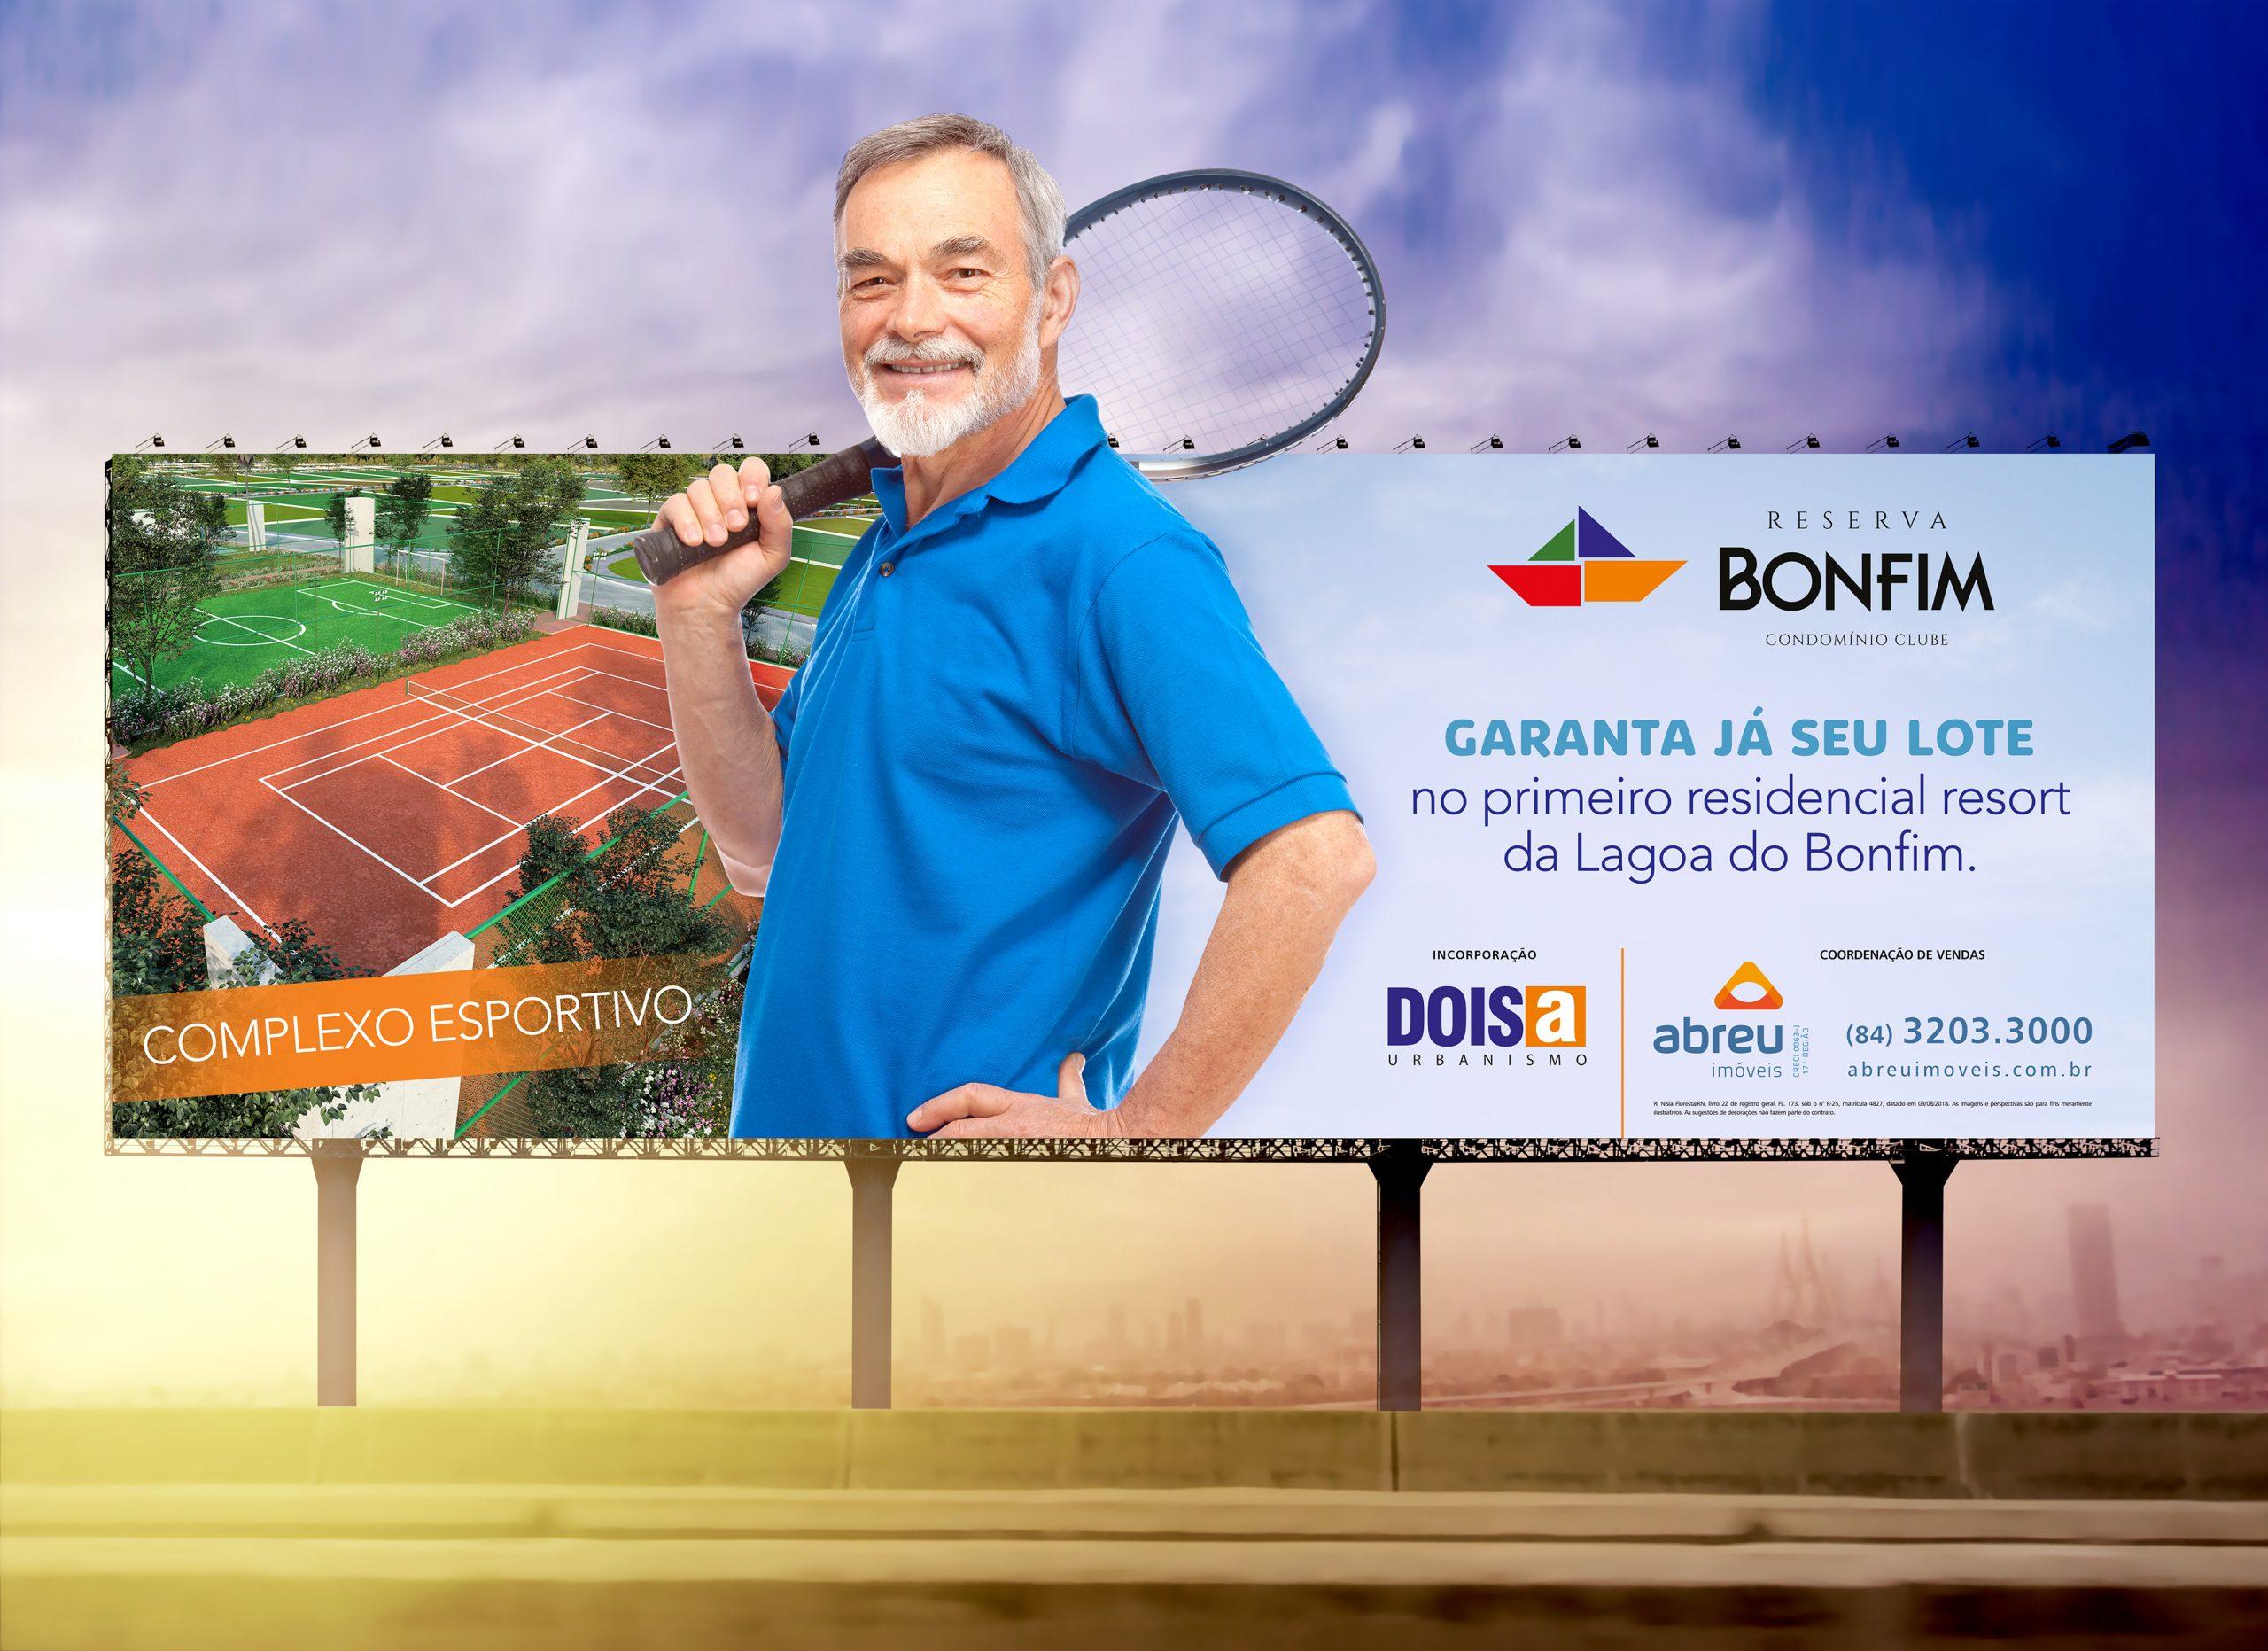 Reserva Bonfim